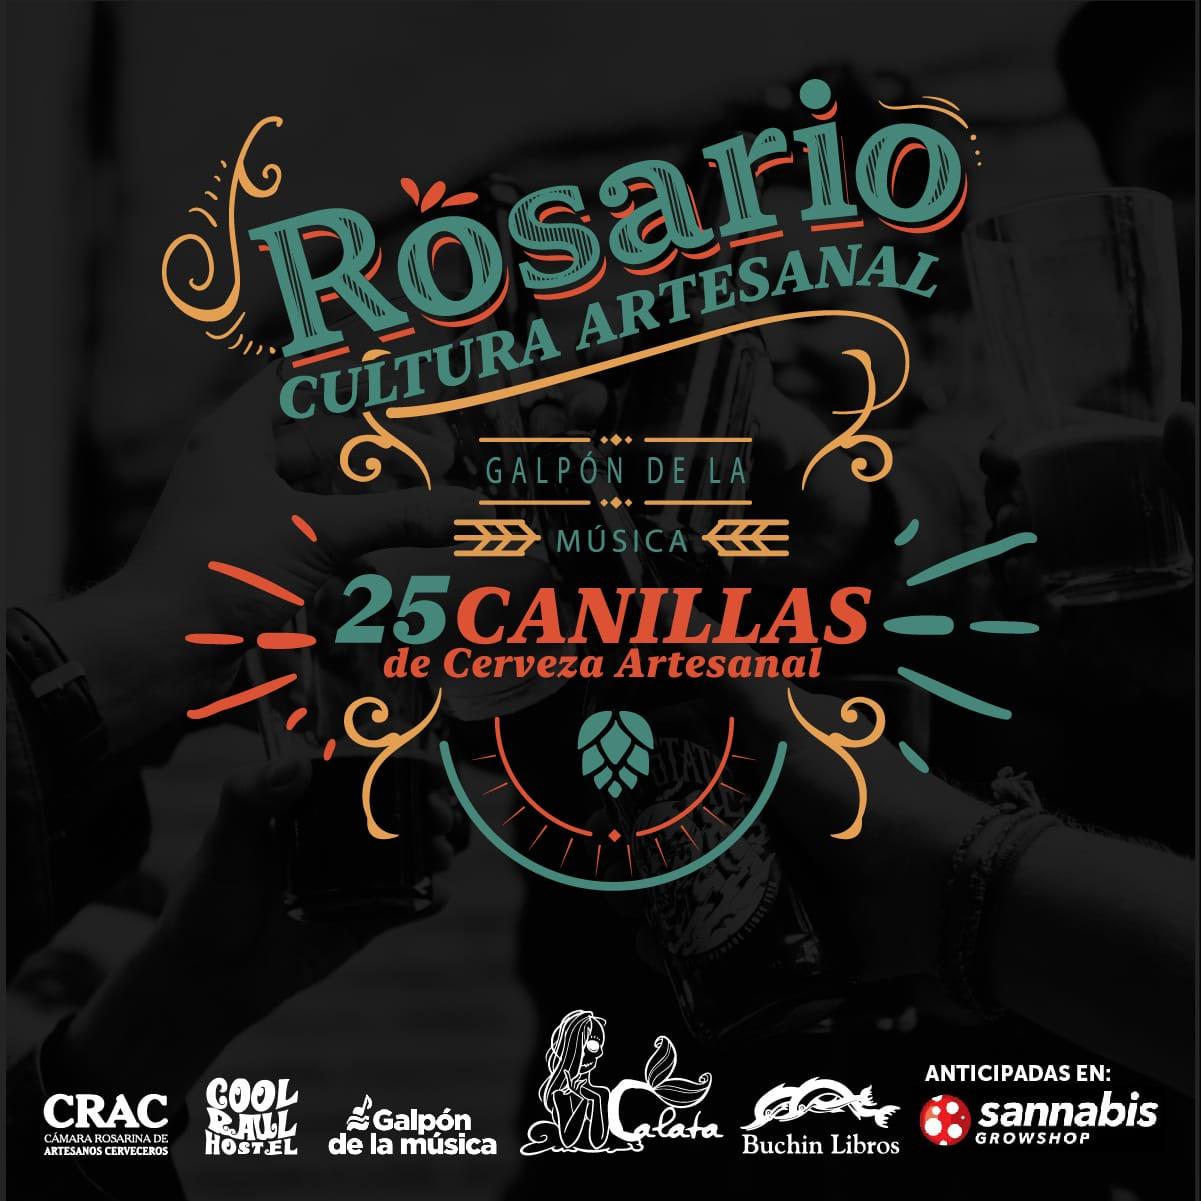 Rosario Cultura Artesanal